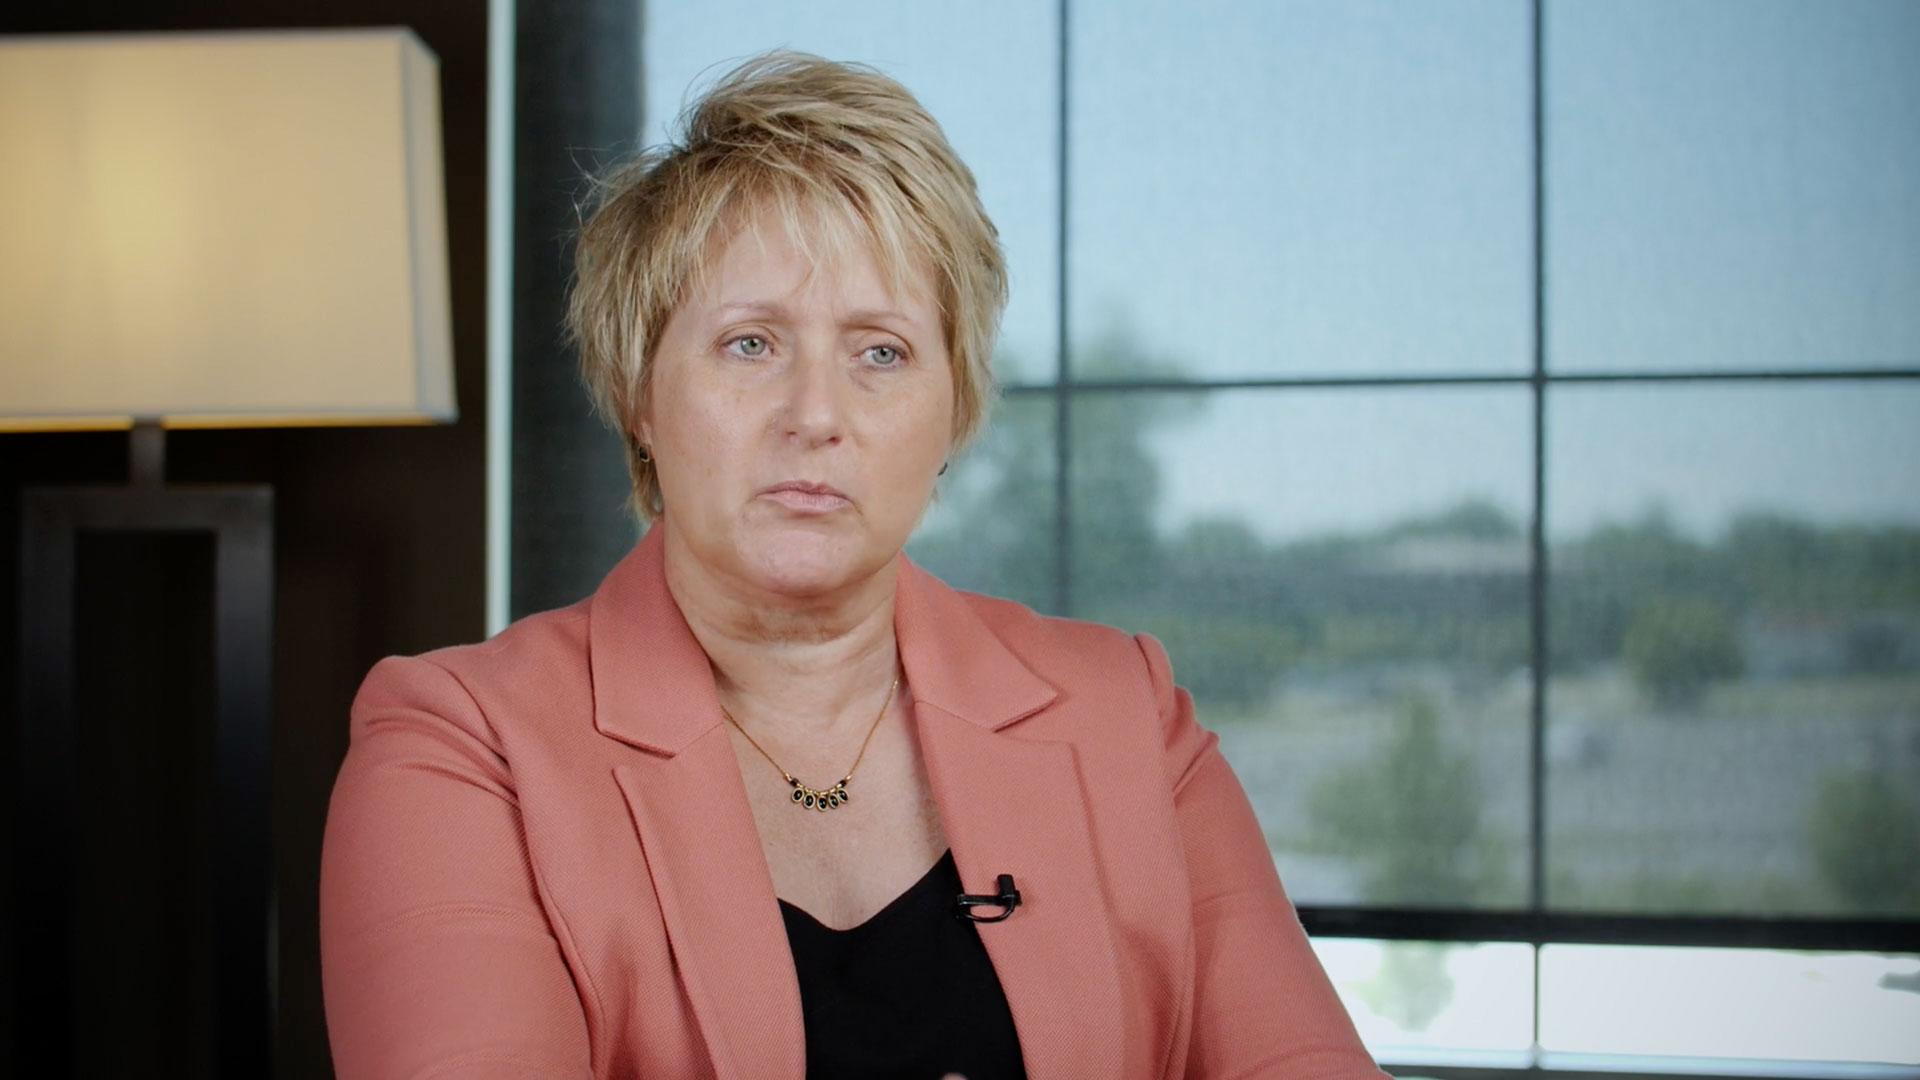 Geanie Umberger, executive director of Purdue Cyber Apprenticeship Program